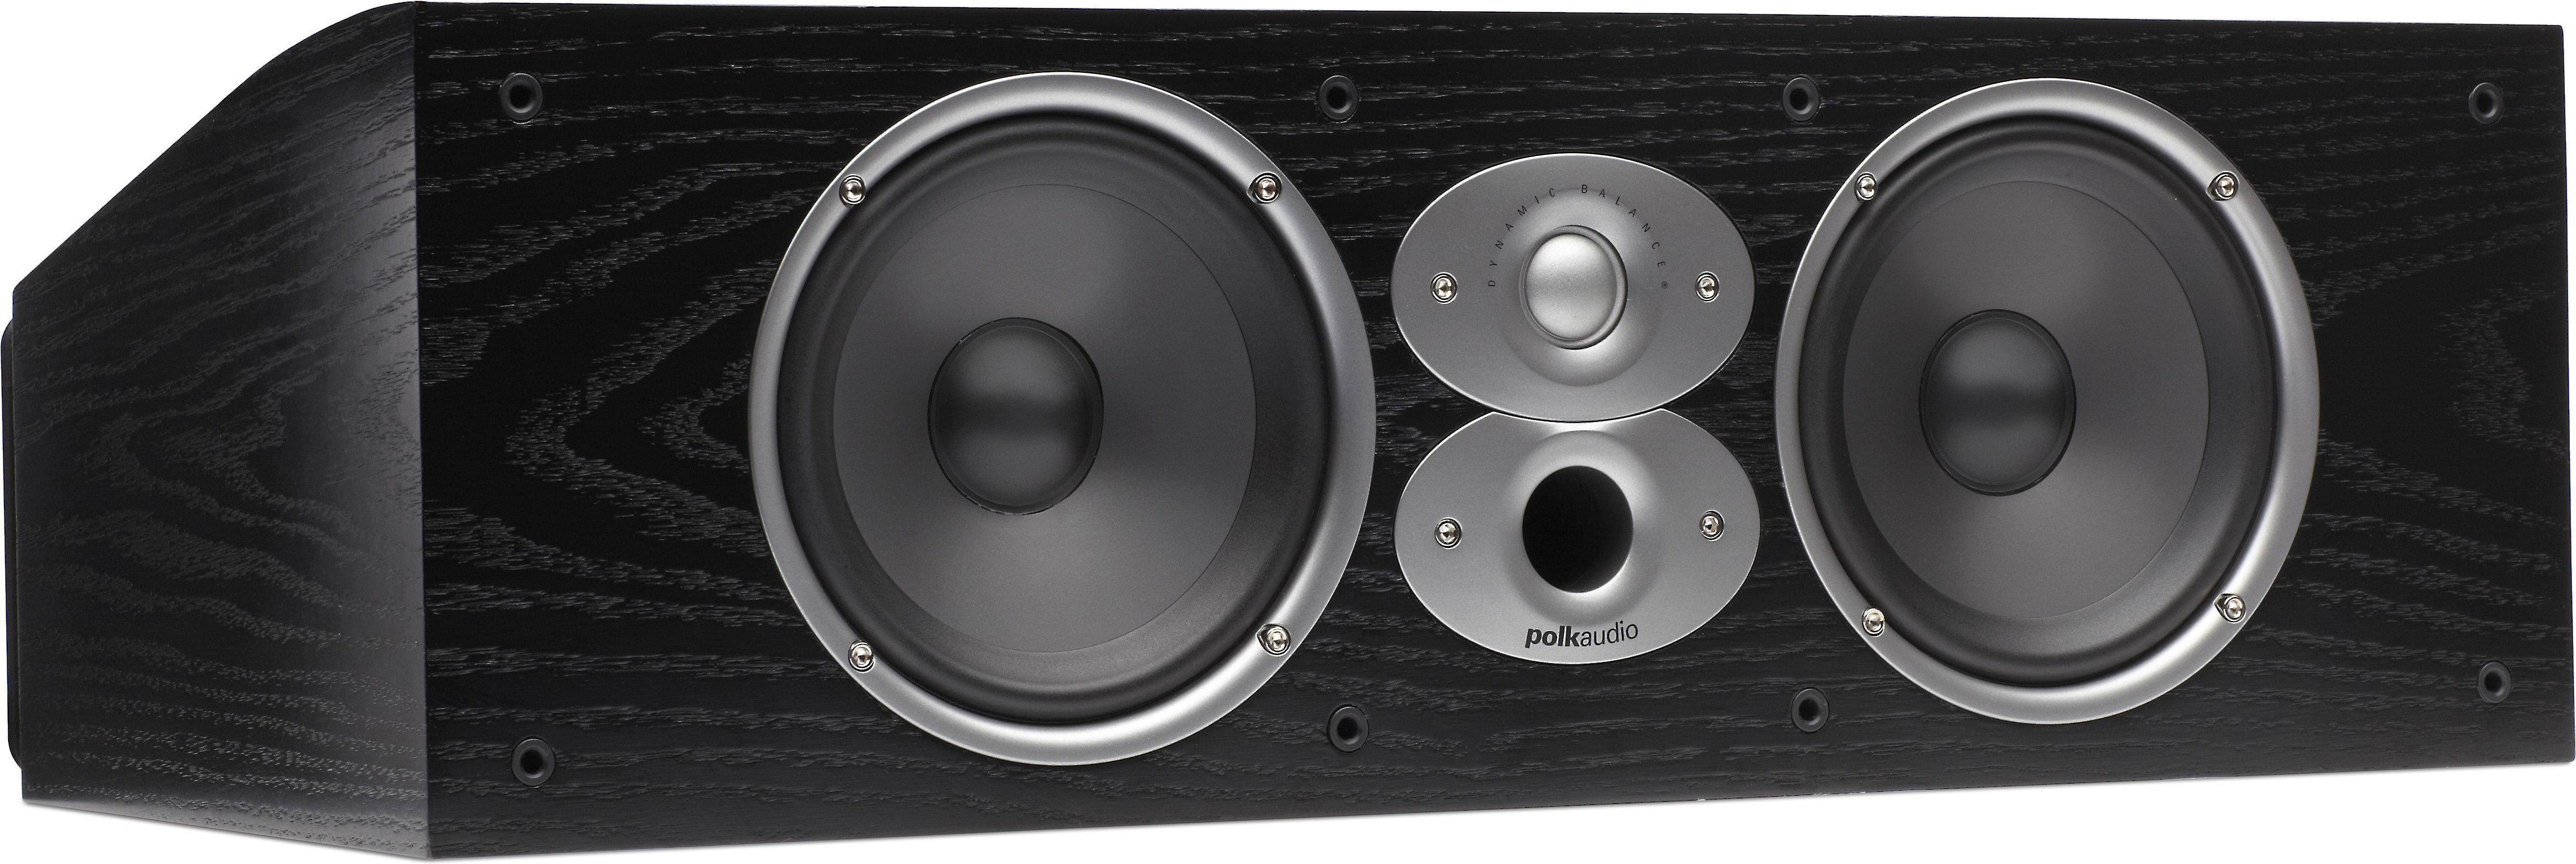 Customer Reviews Polk Audio Csi A6 Black Center Channel Speaker At Crutchfield